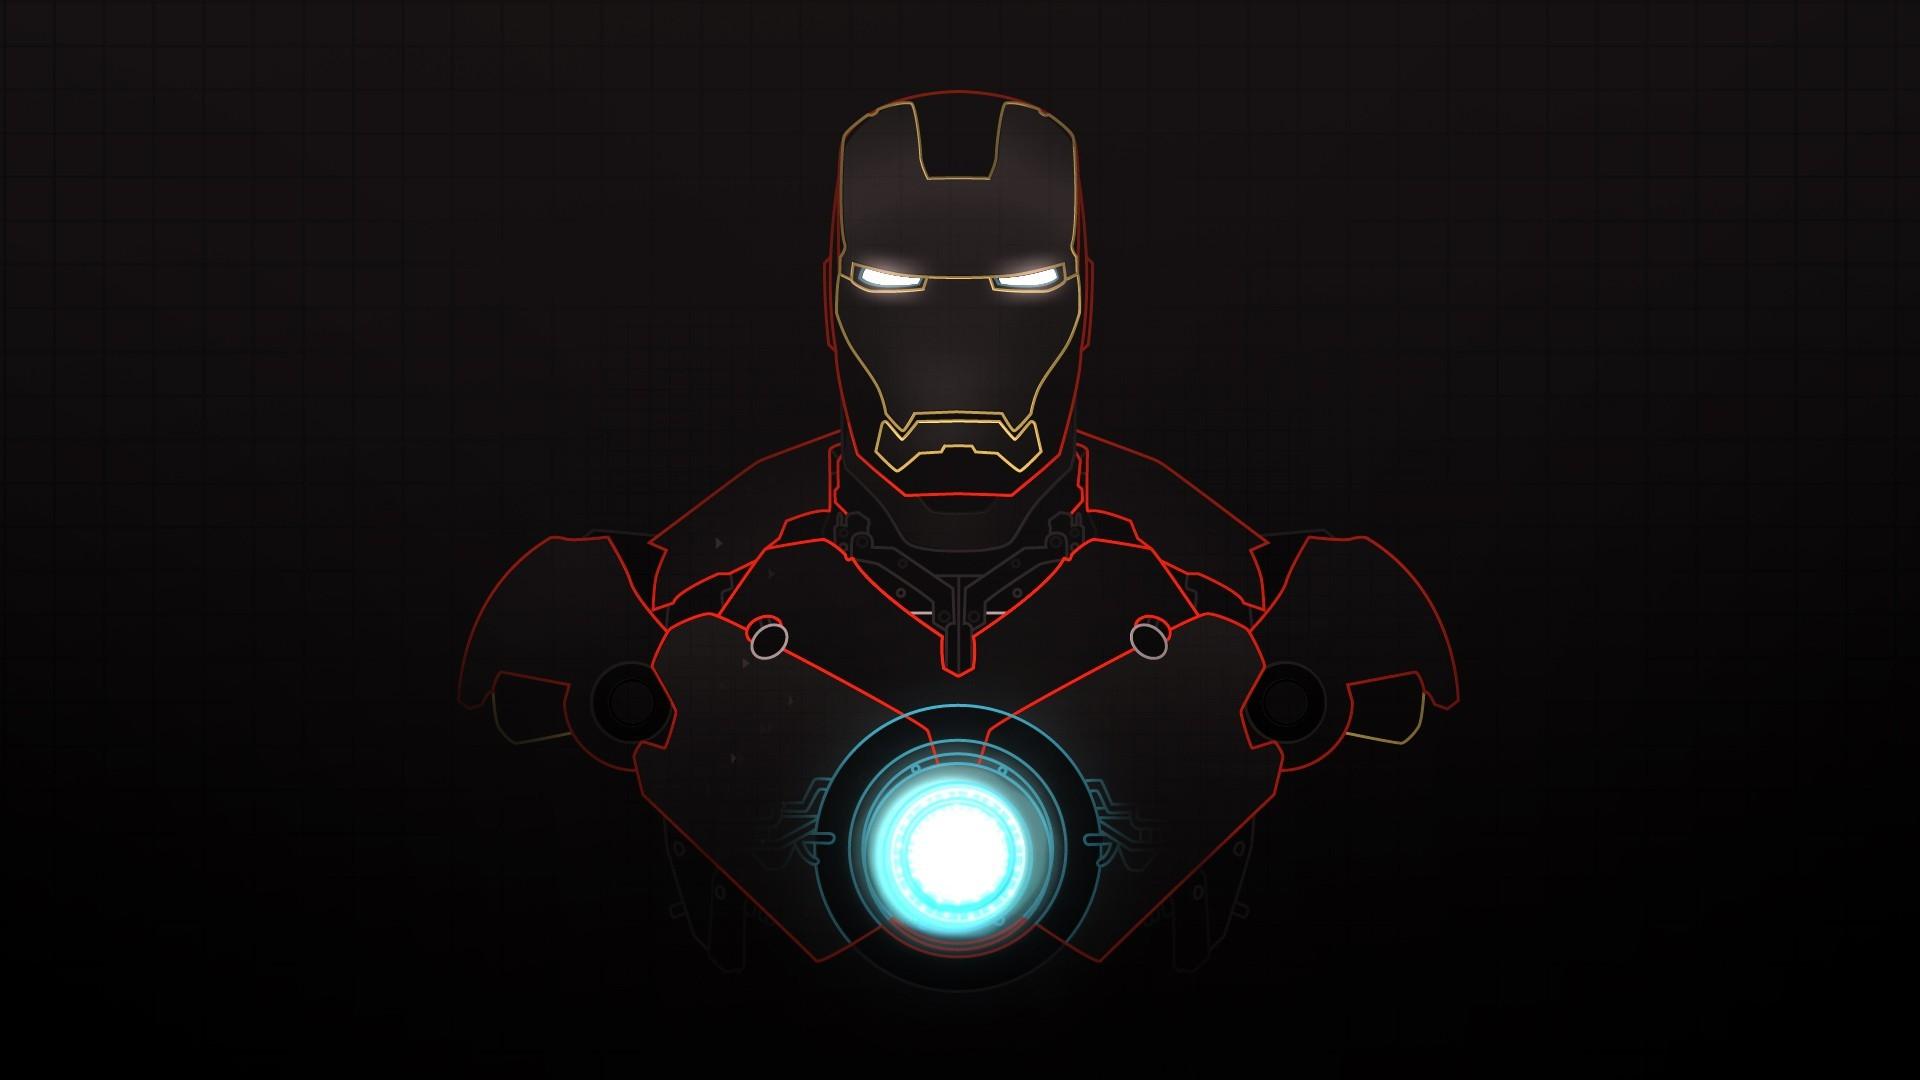 Iron Man Minimalist wallpaper